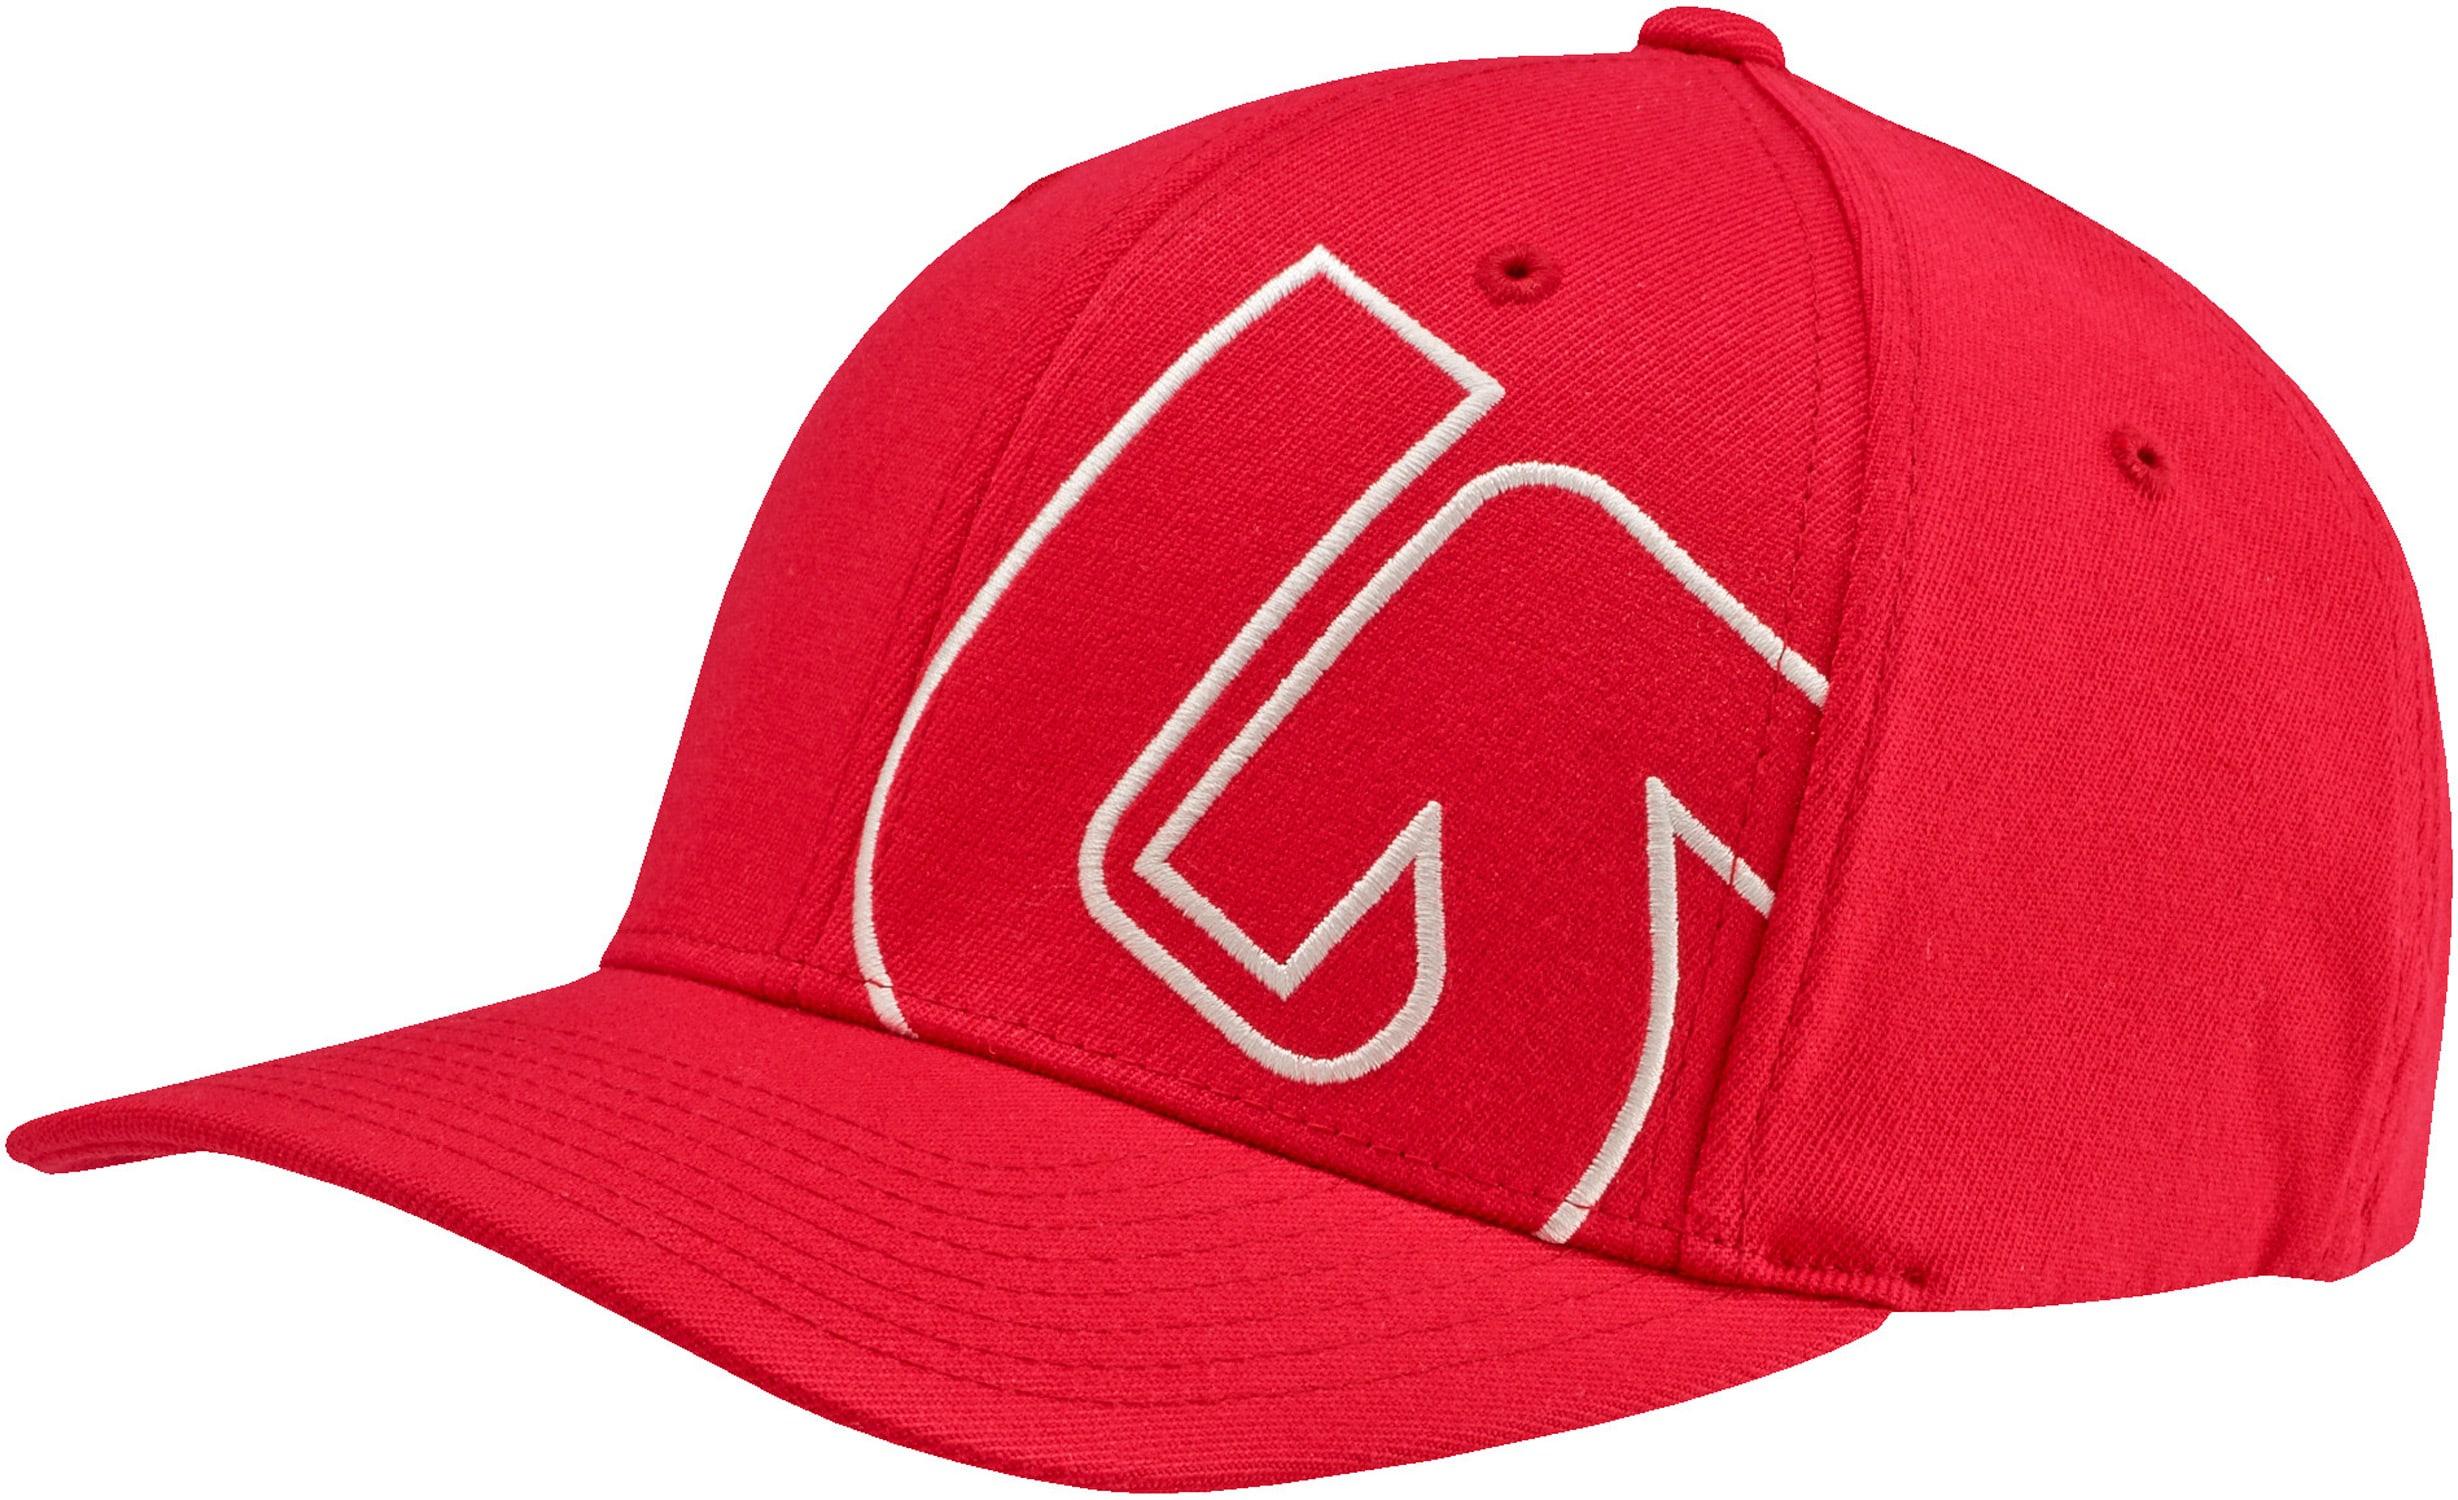 e28646ec33a Burton Slidestyle Flex Fit Cap - thumbnail 1